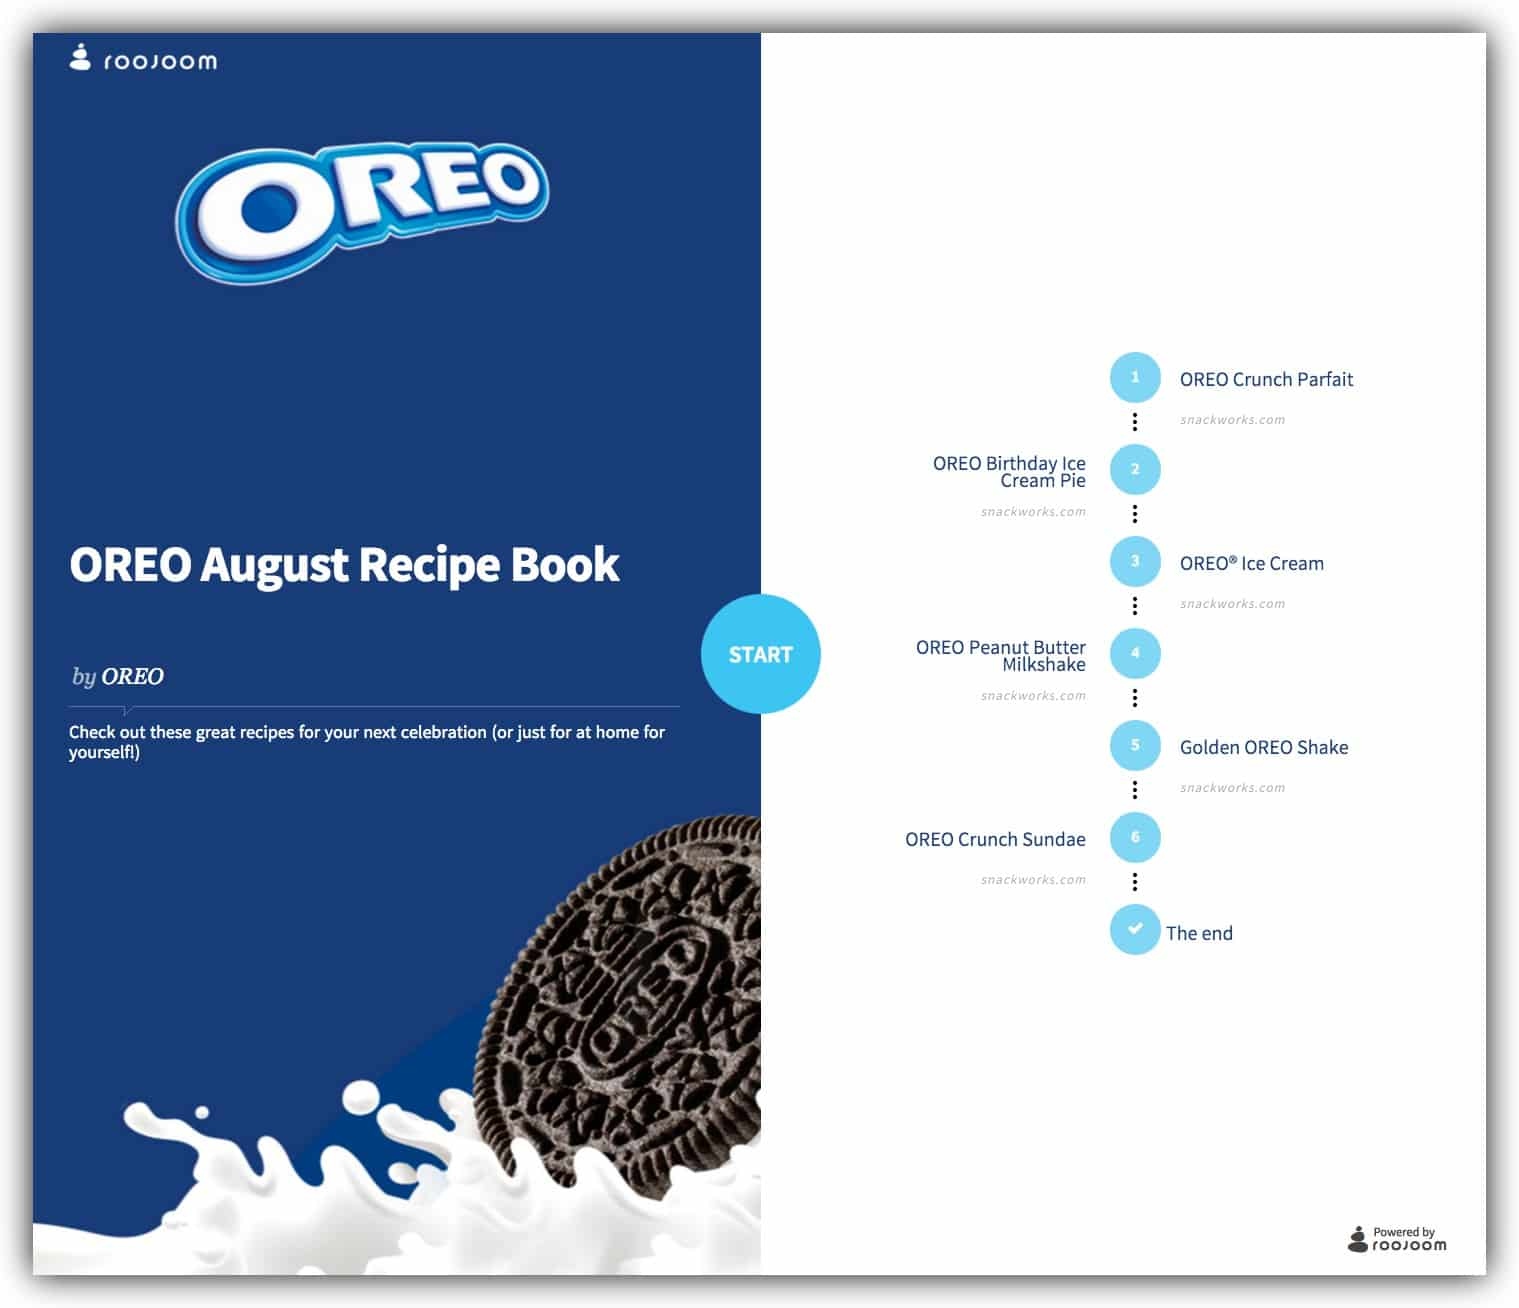 OREO_August_Recipe_Book